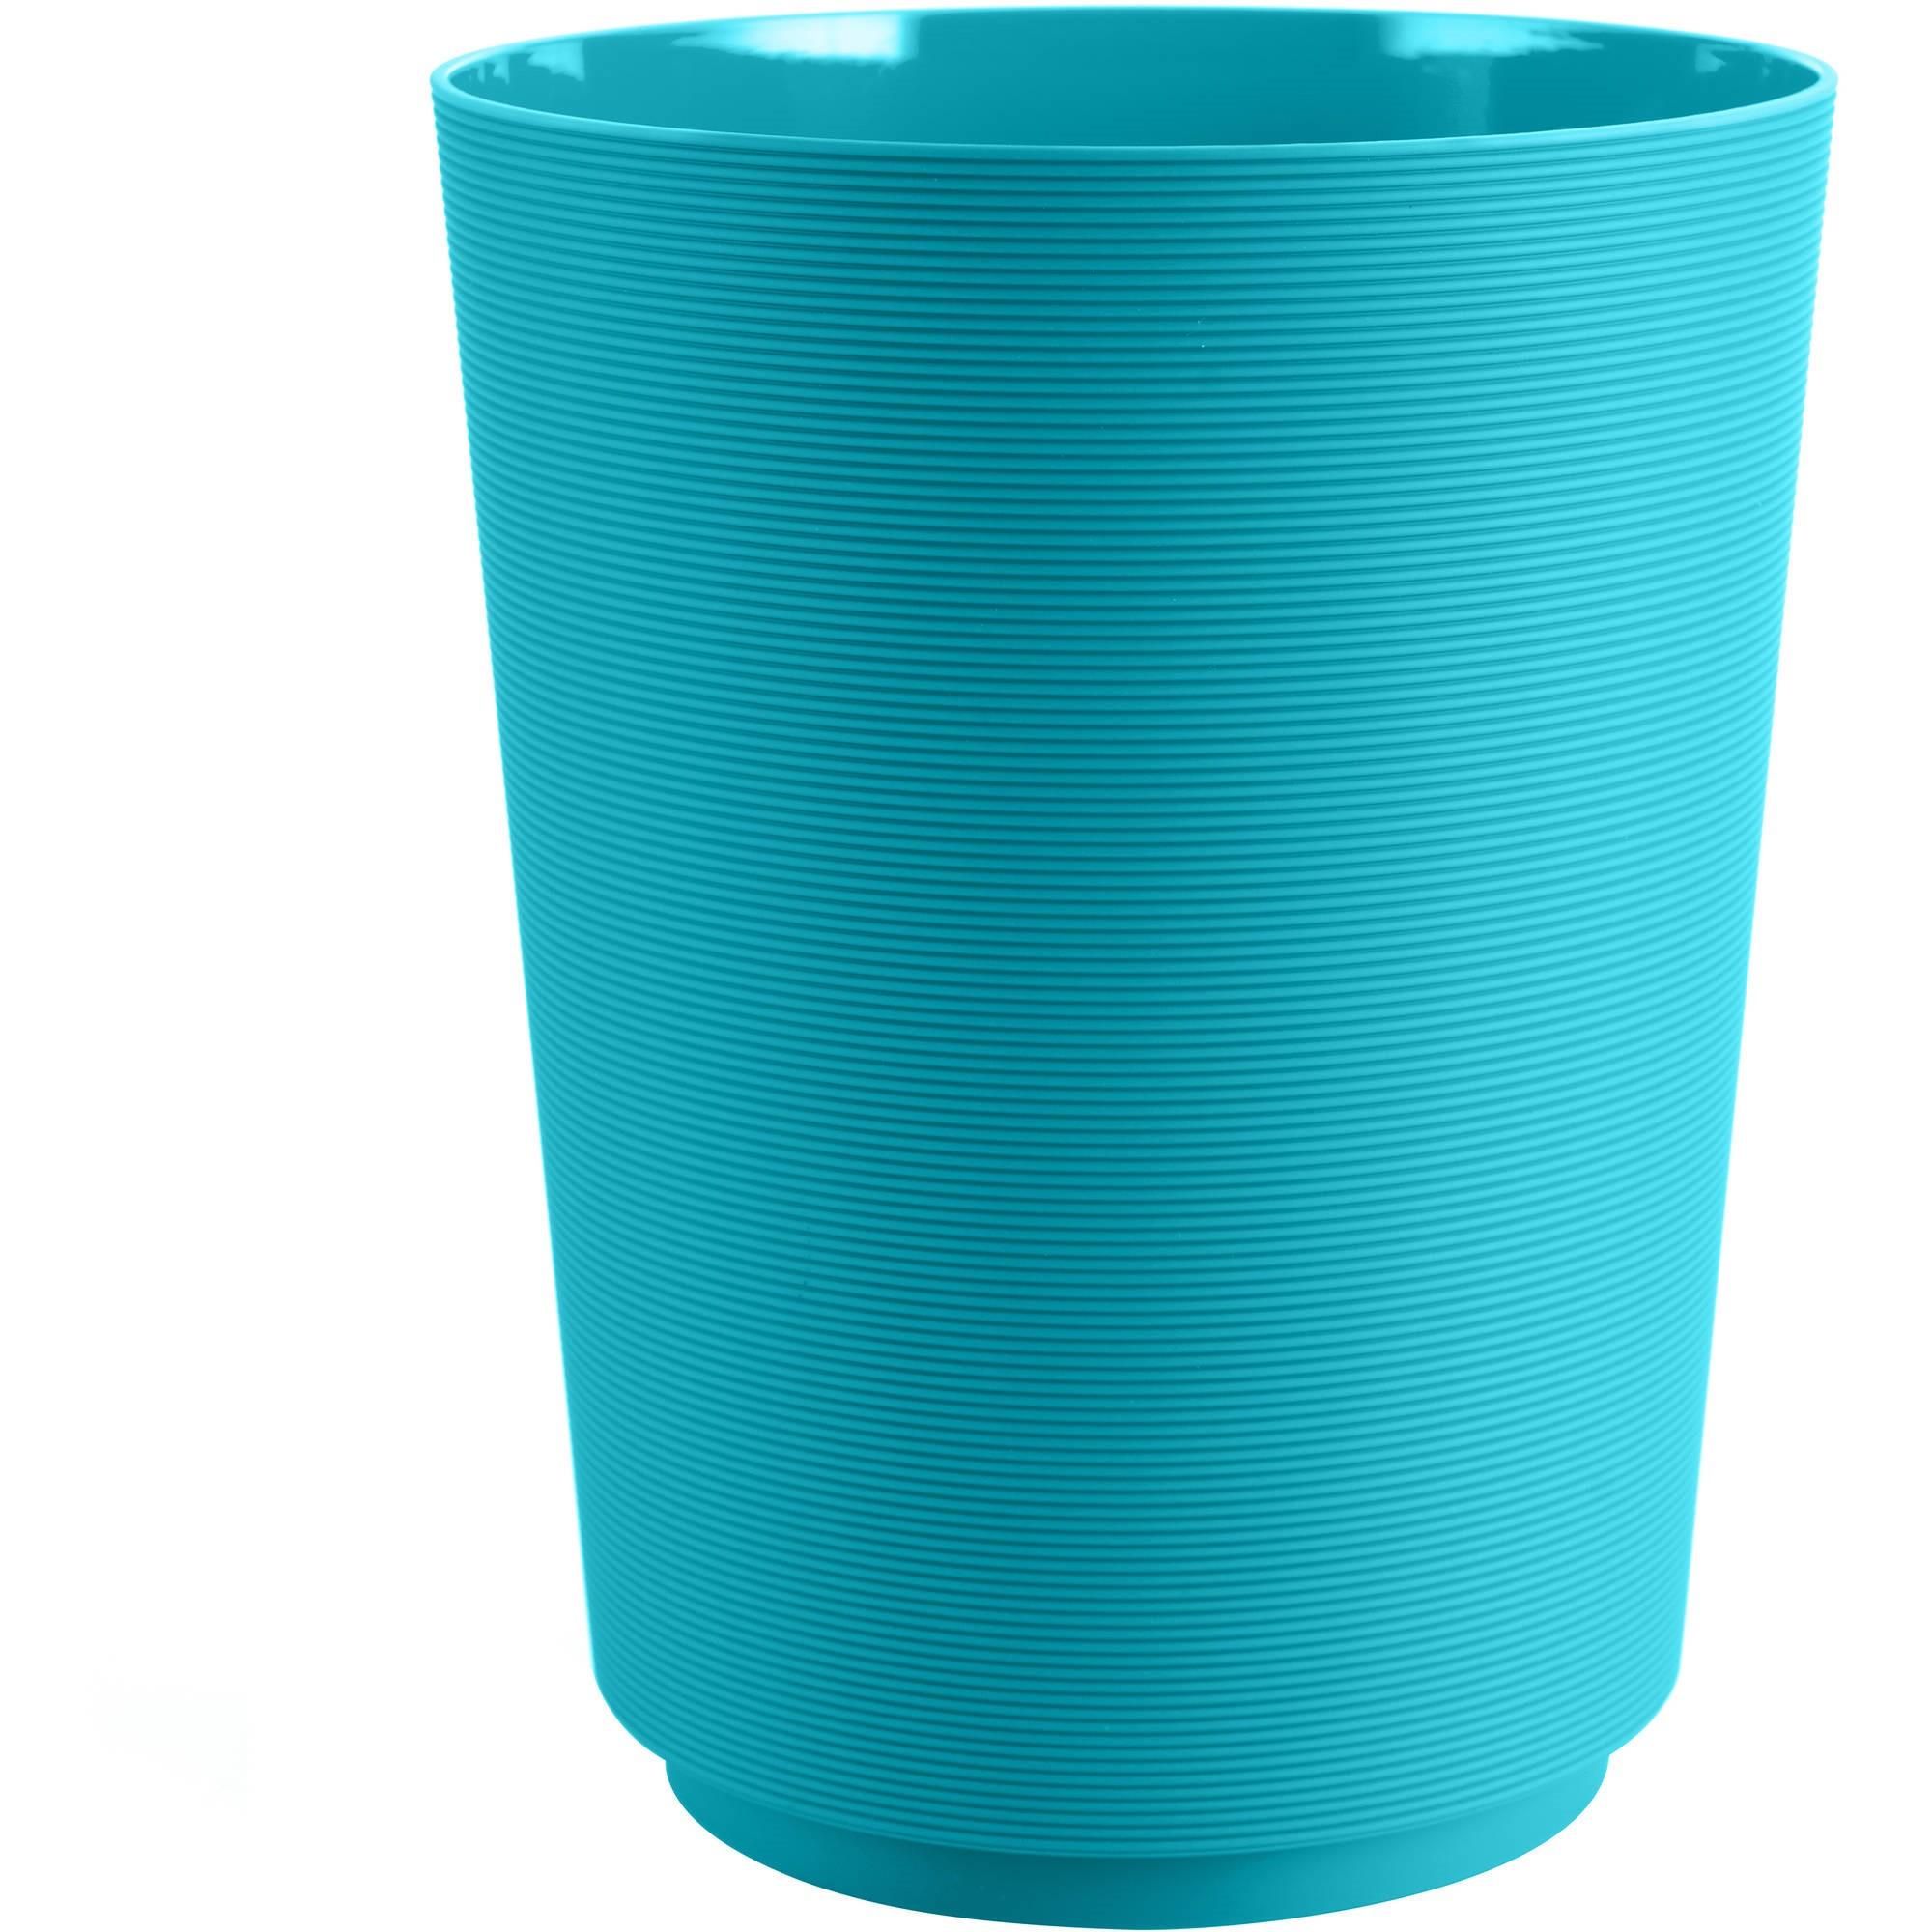 Mainstays Soft Touch Grey Wastebasket, 1 Each